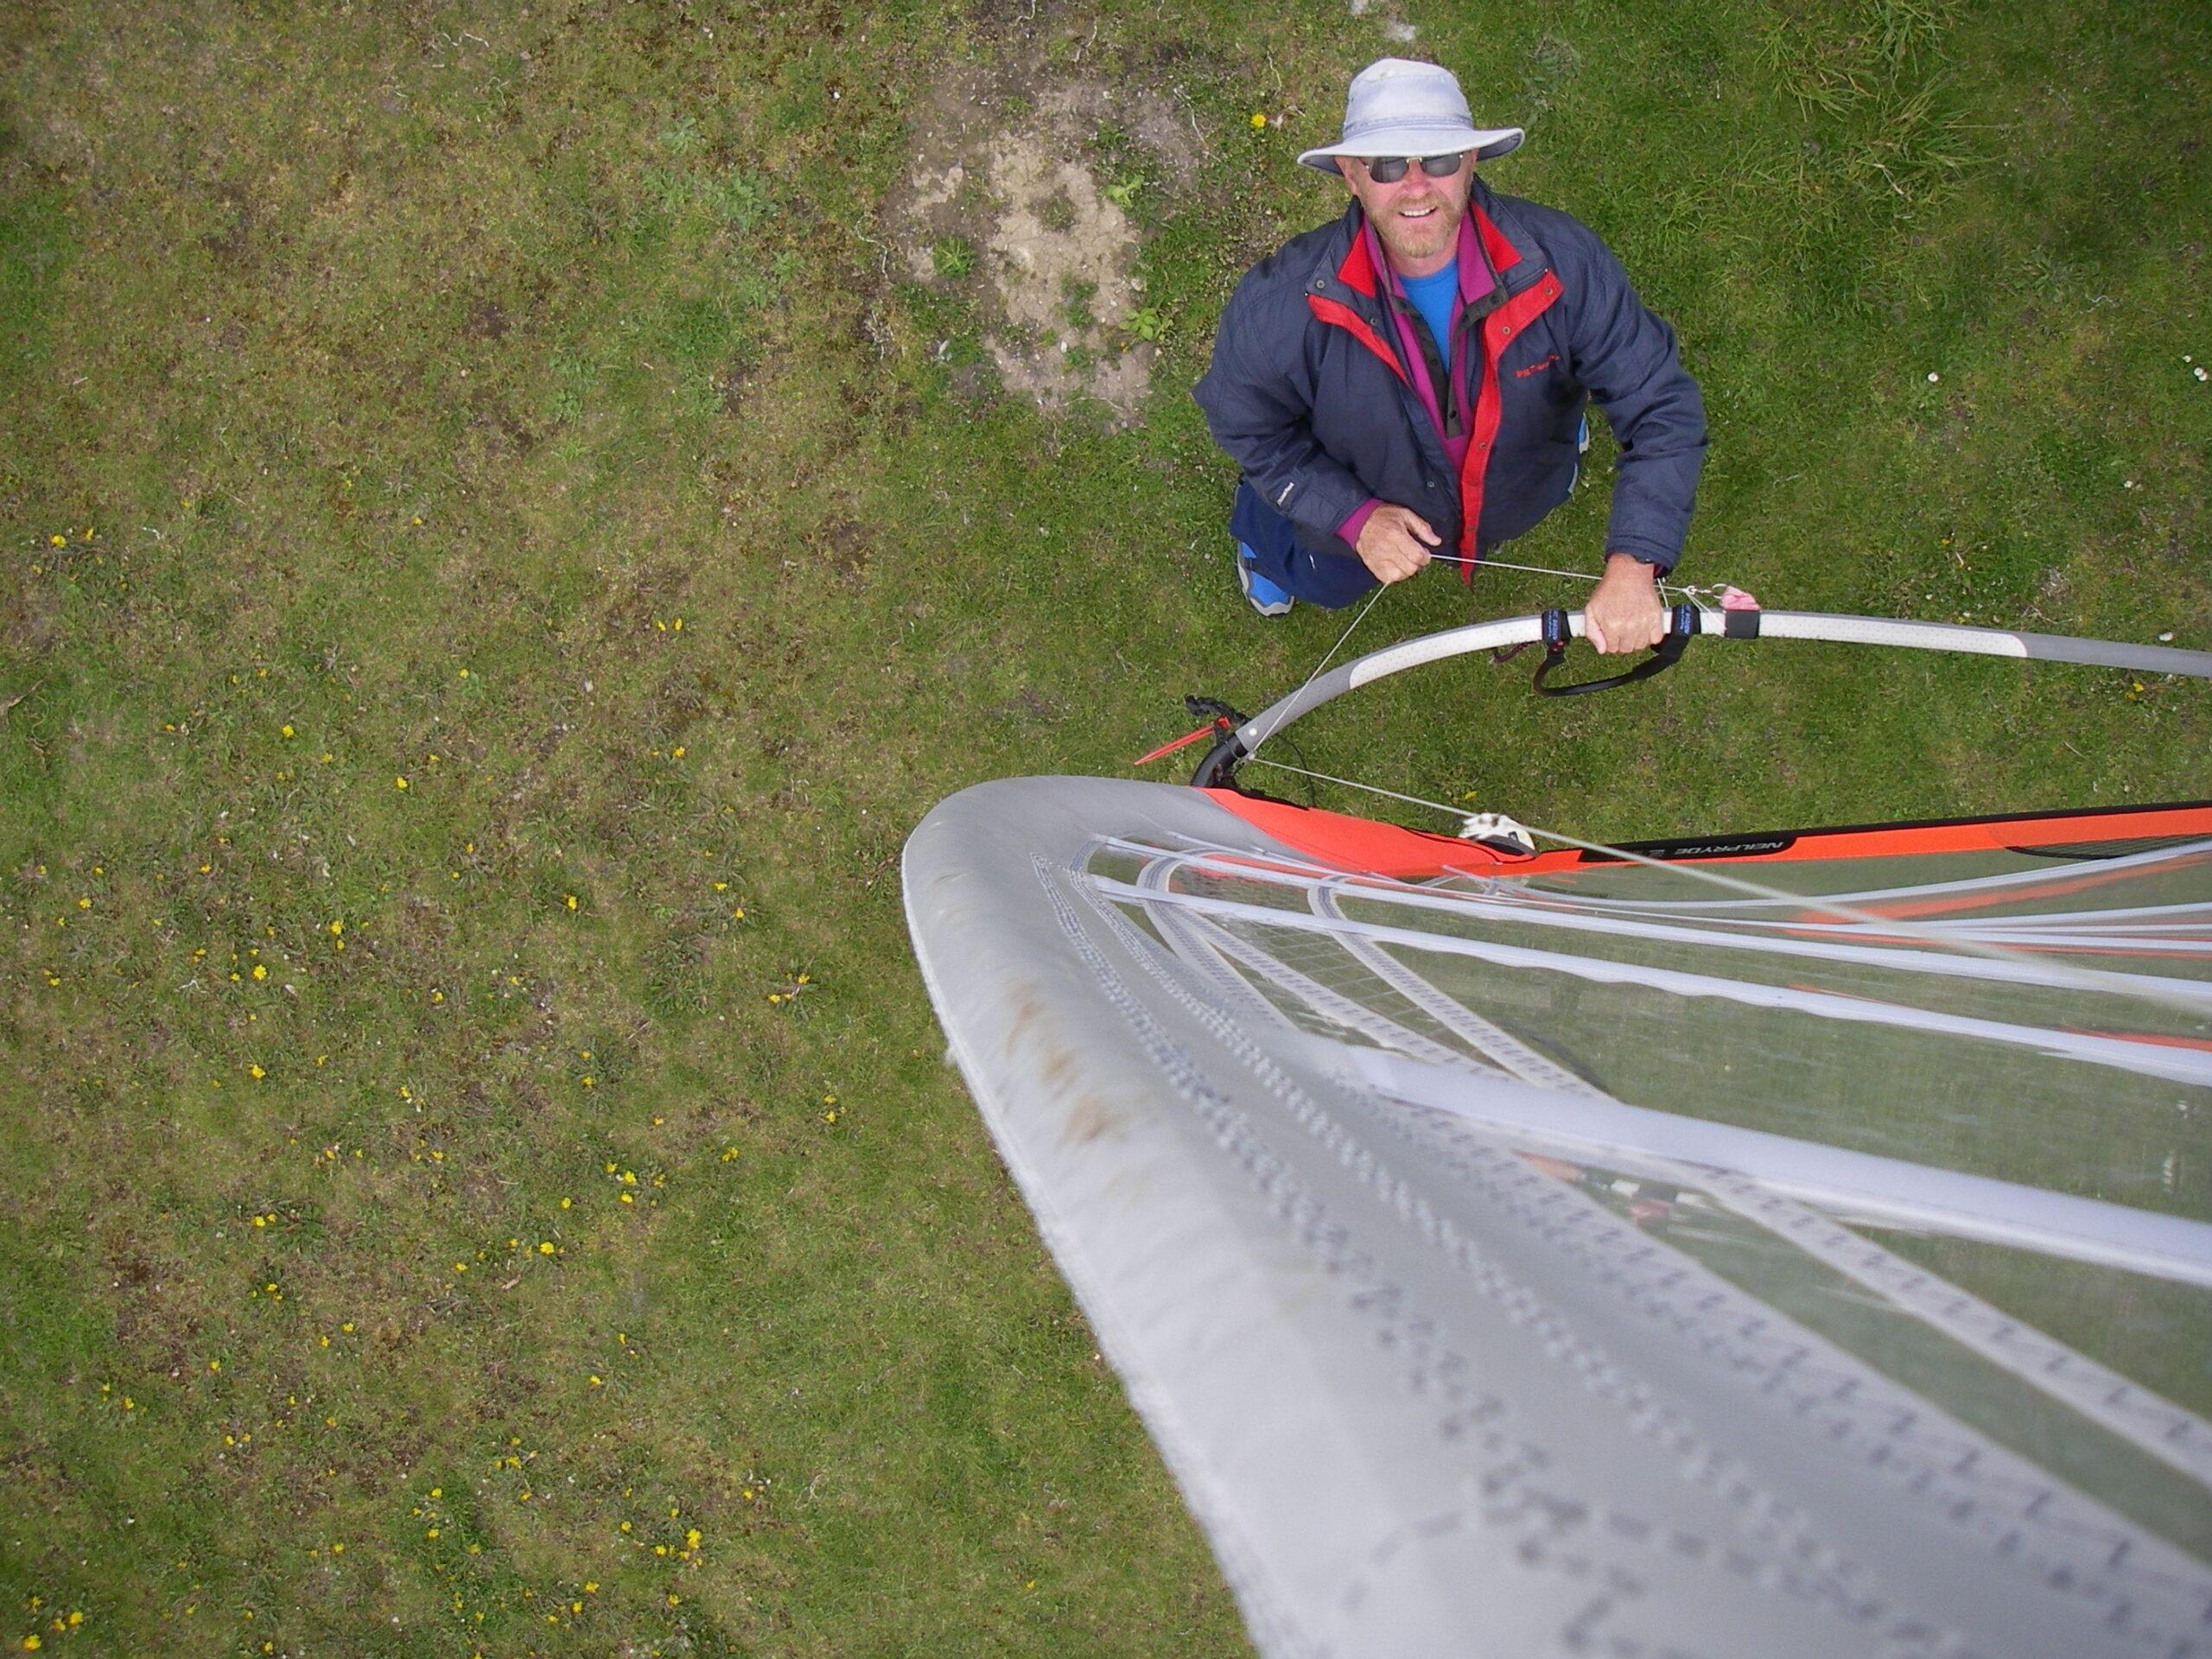 2007 Janne testar mastkamera - 1998 - 2007